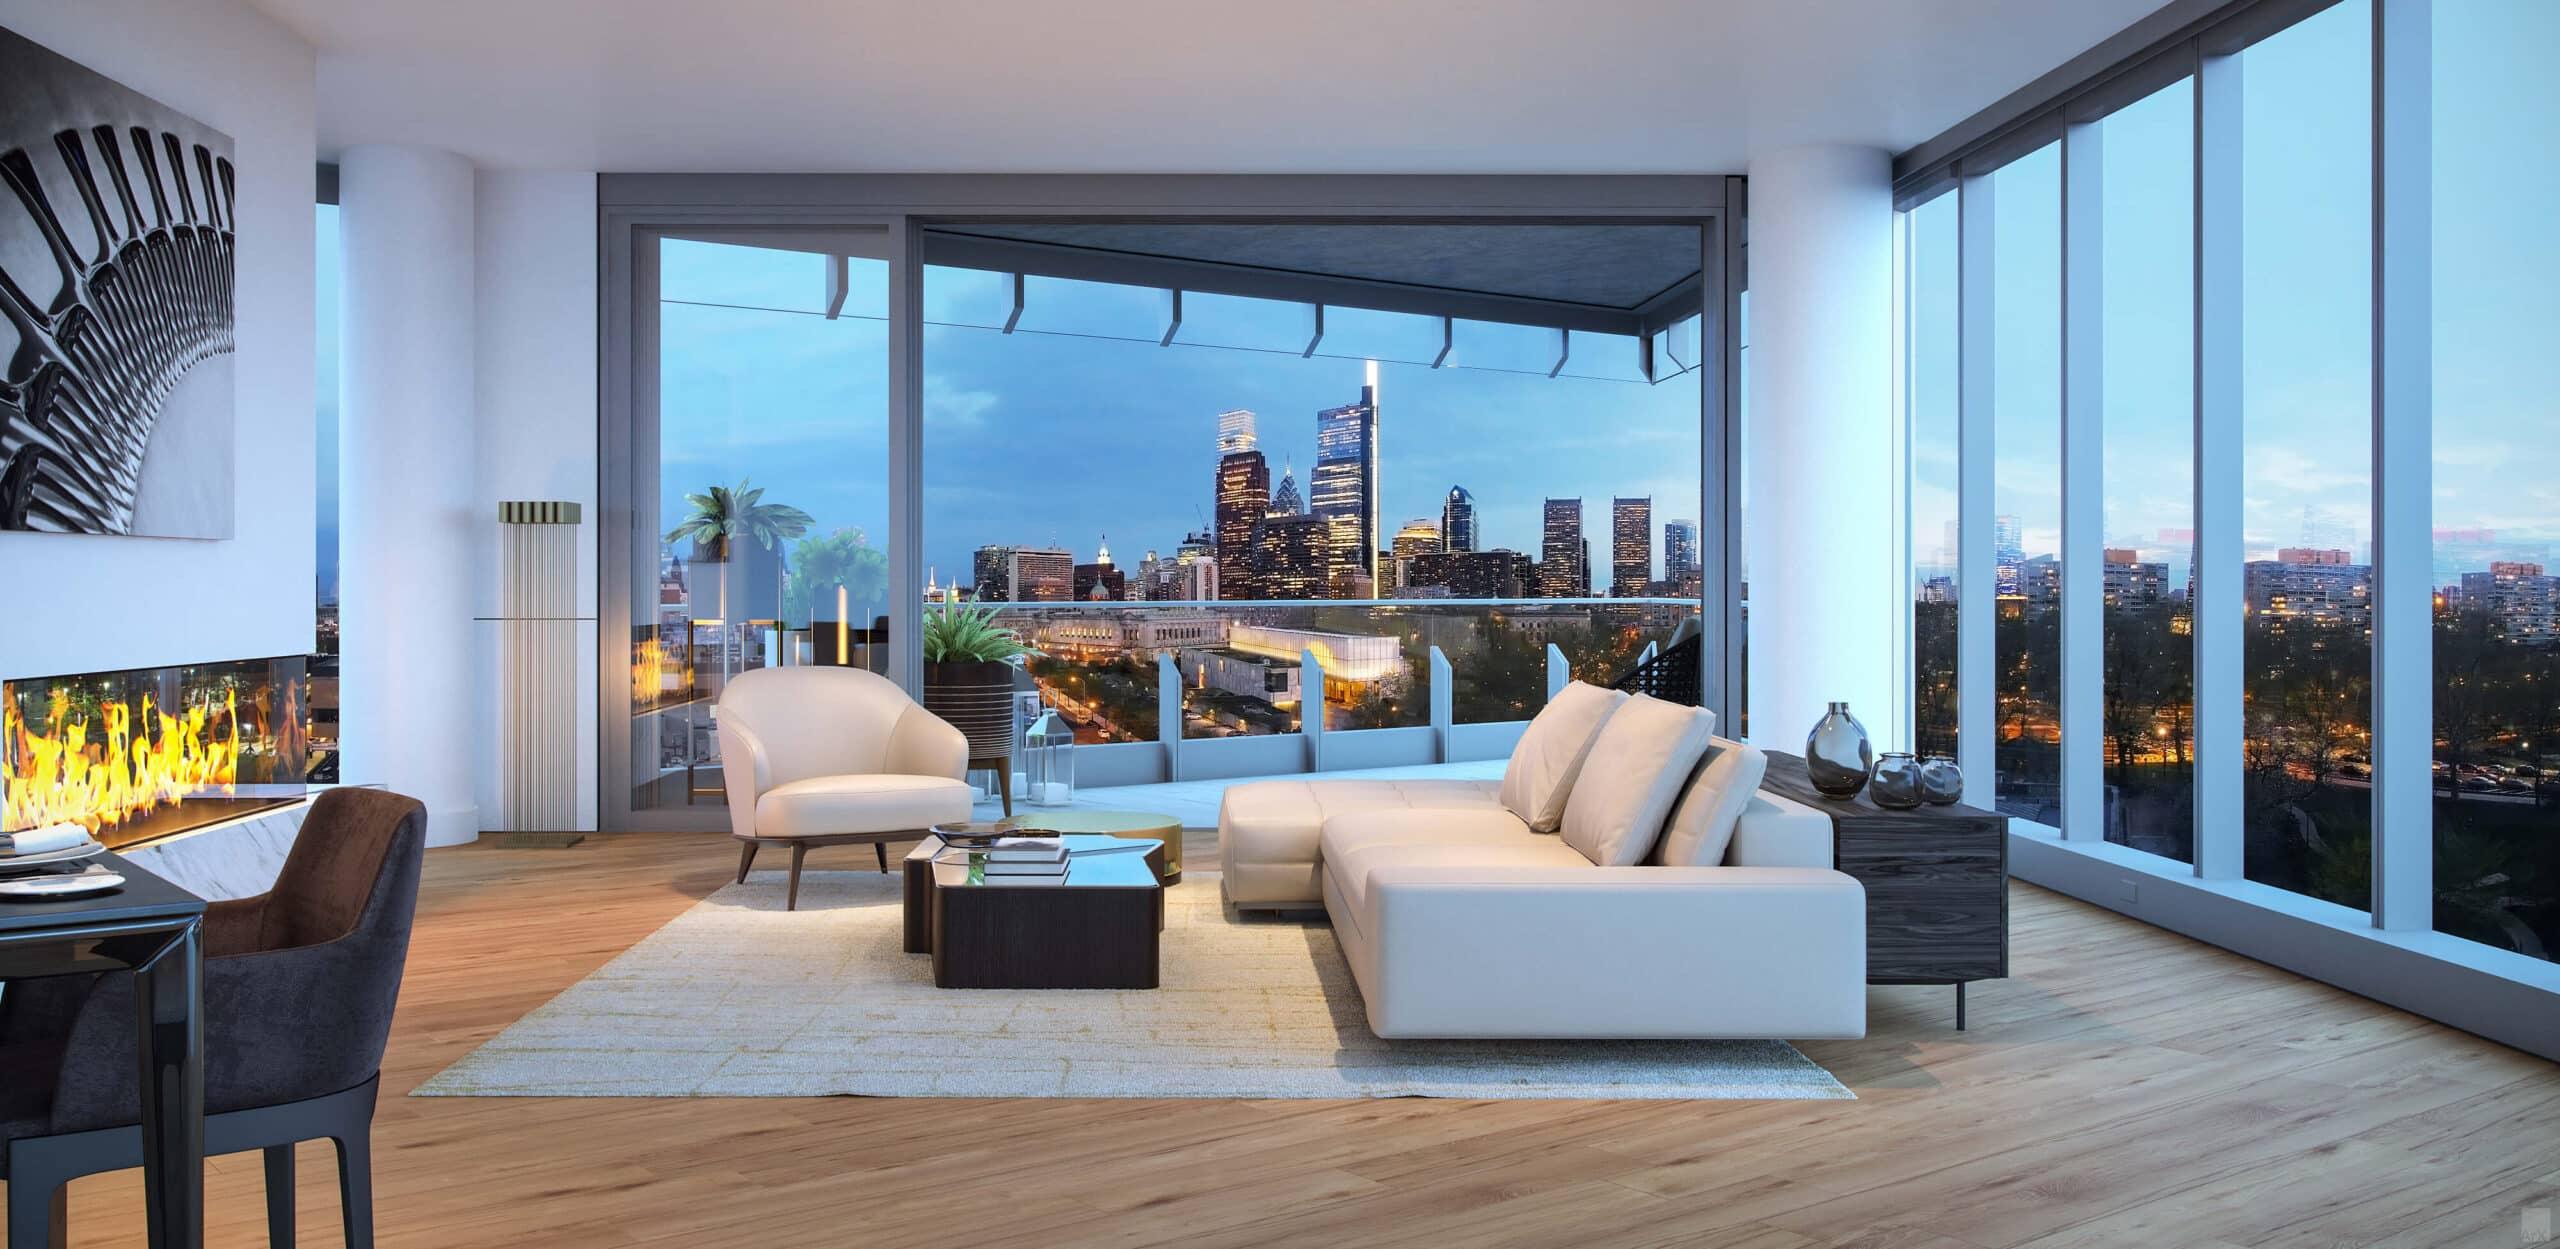 white furniture in living room of stylish, luxury condo in Philadelphia